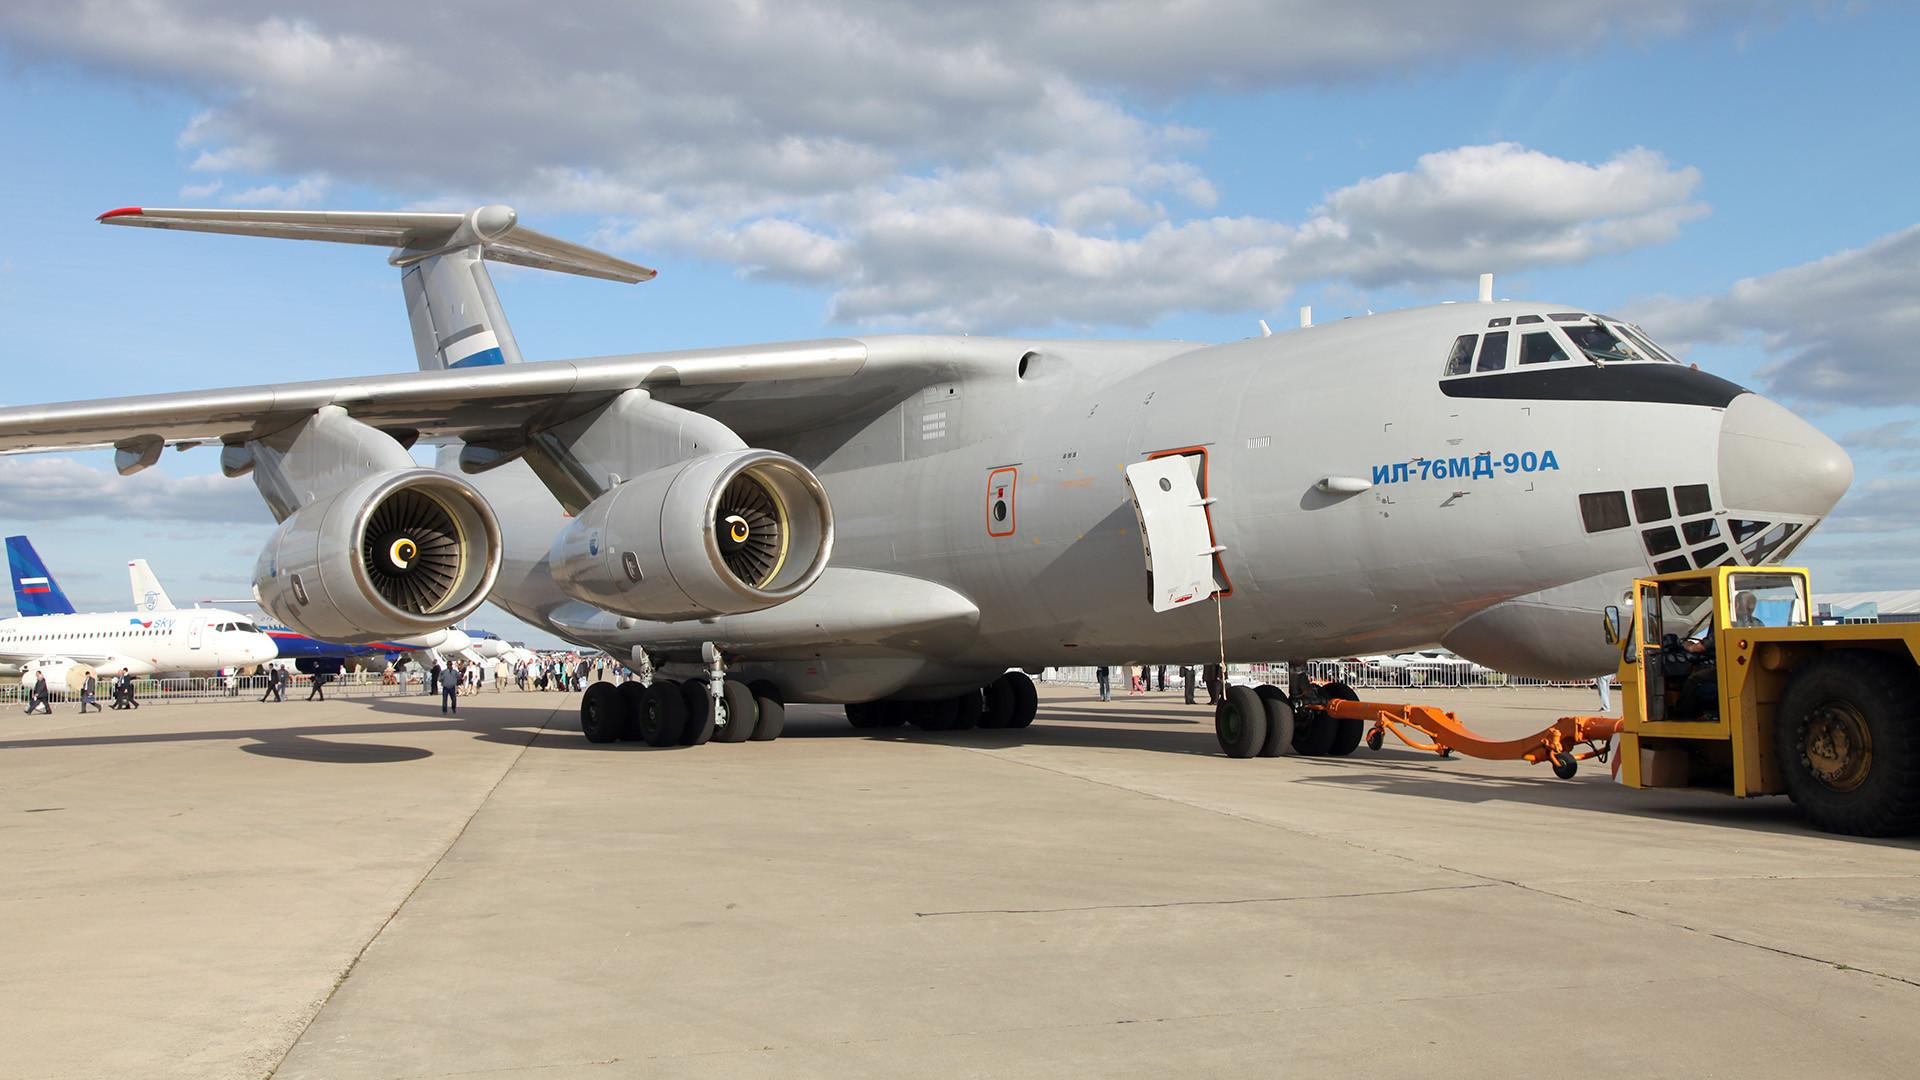 Самолет Ил-76МД-90А.